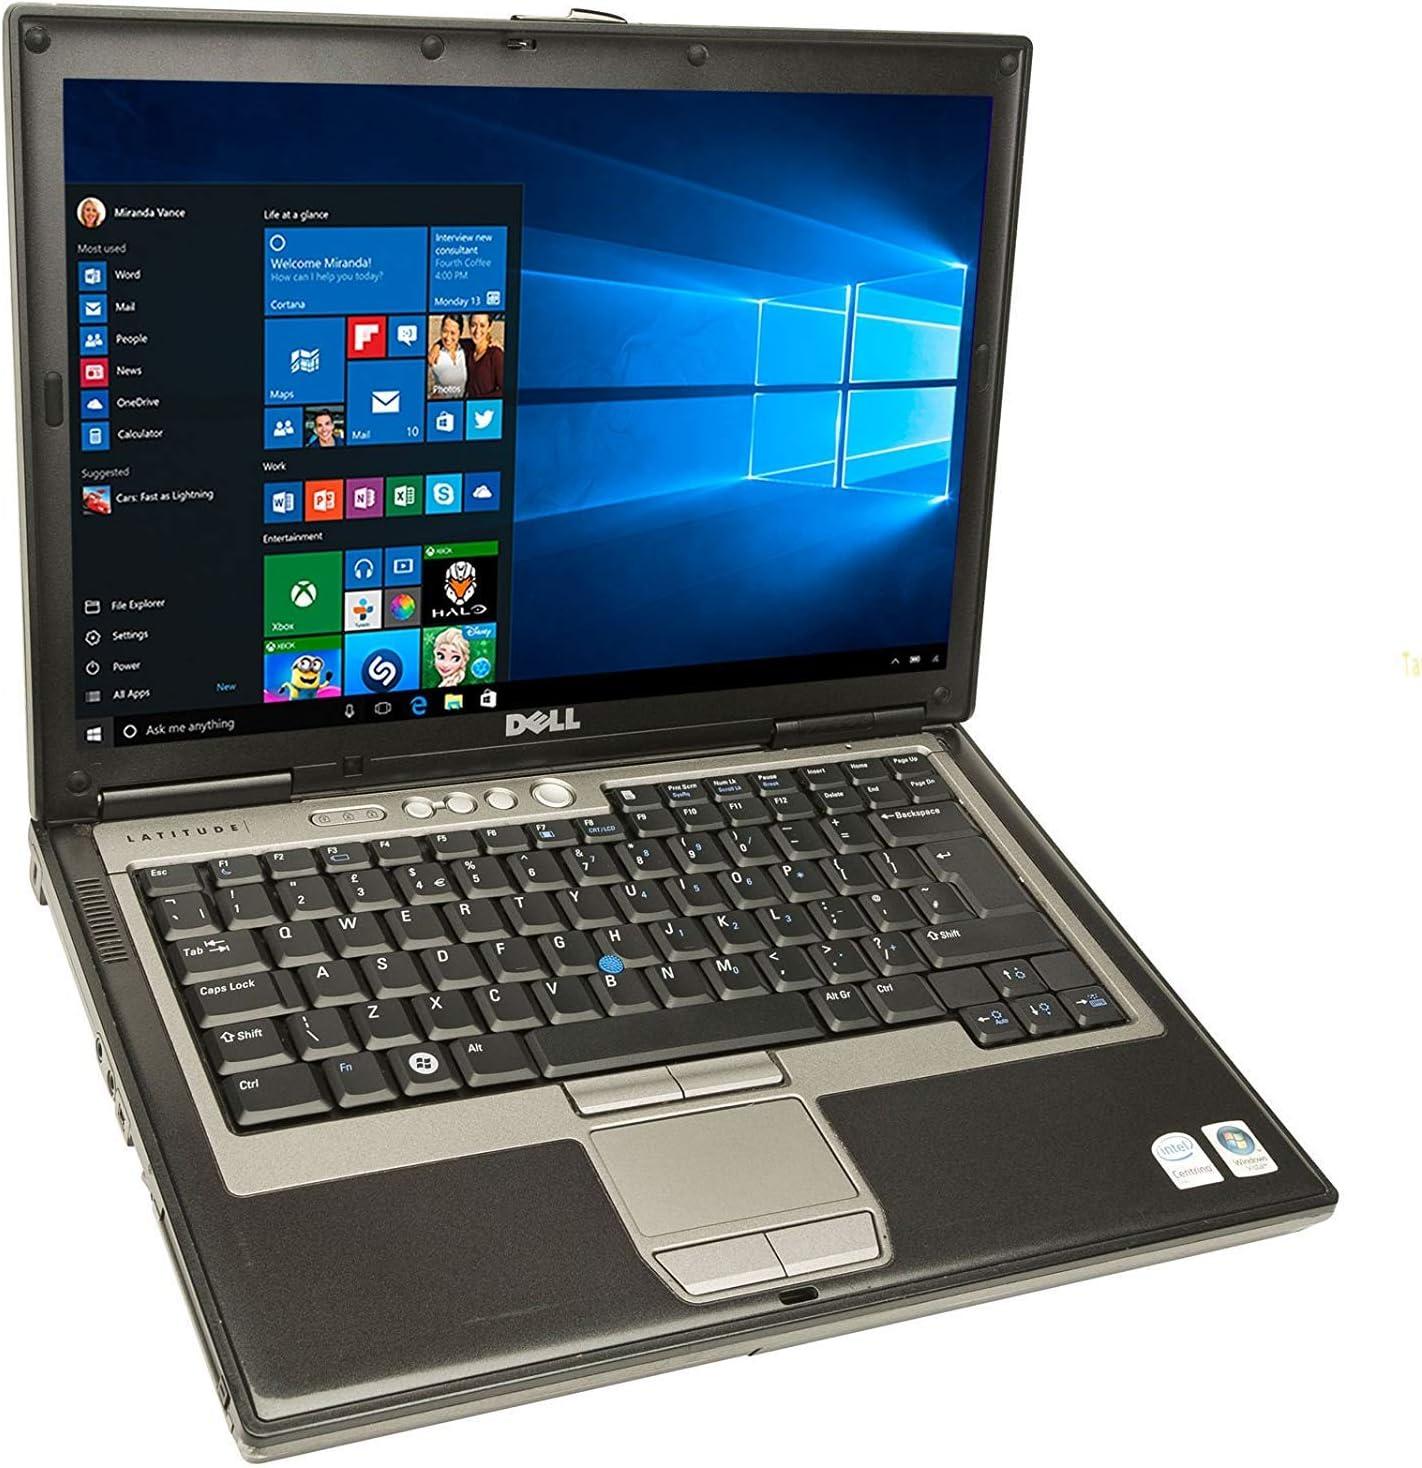 Dell Latitude ATG D630 14.1-Inch Notebook